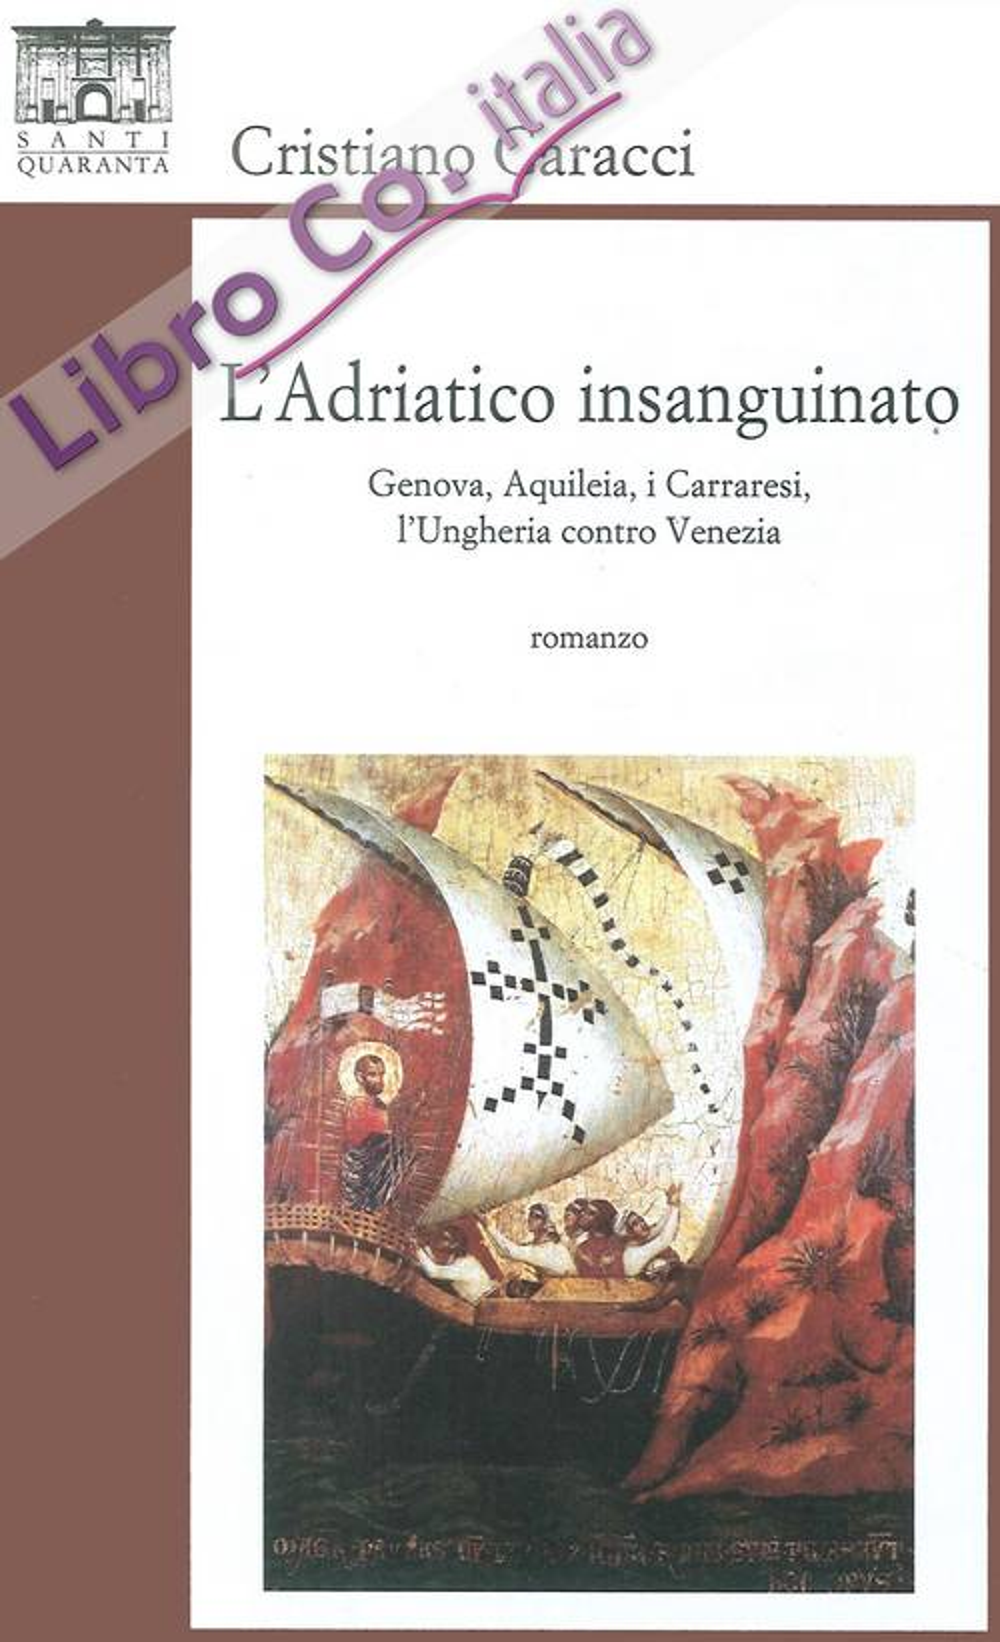 L'Adriatico insanguinato. Genova, Aquileia, i carraresi, l'ungheria contro venezia